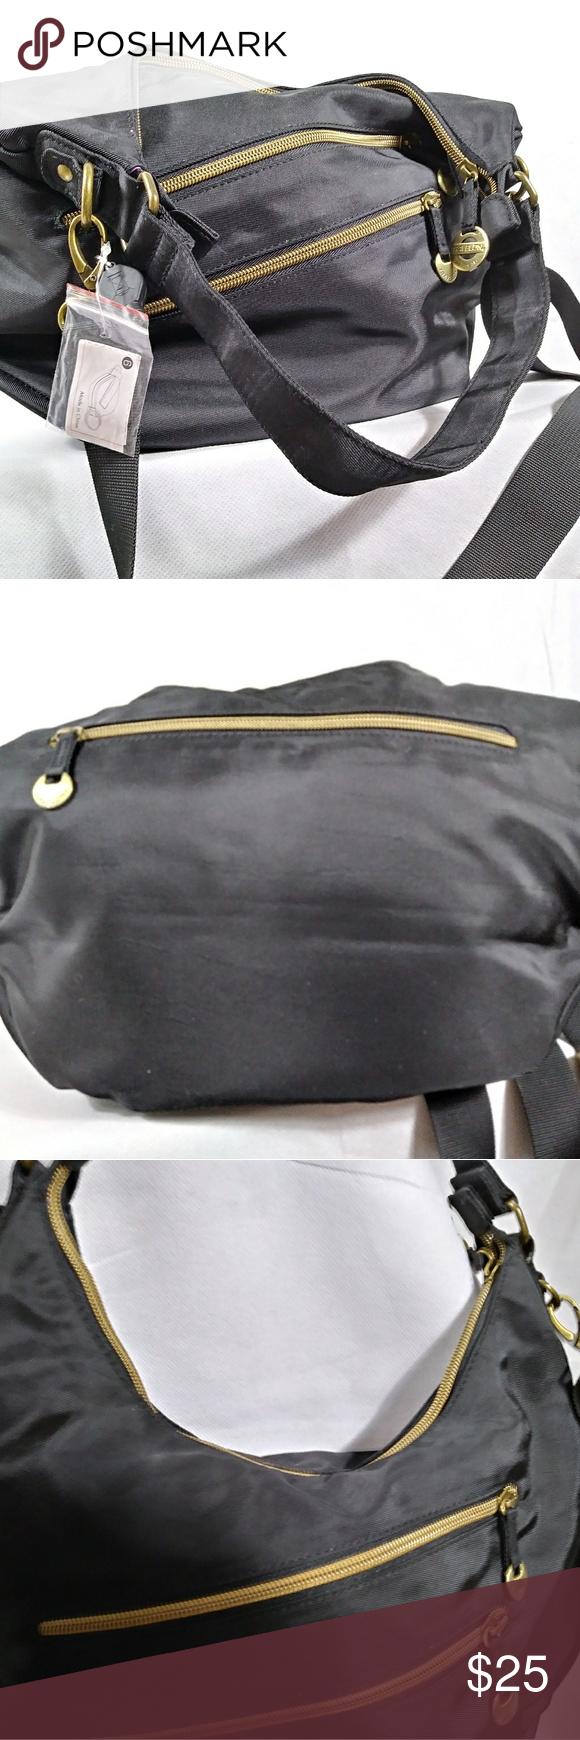 TRAVELON RFID Blocking Crossbody Bag NWT TRAVELON RFID Blocking Crossbody  Bag NWT Two straps One strap 8ff220a7e1